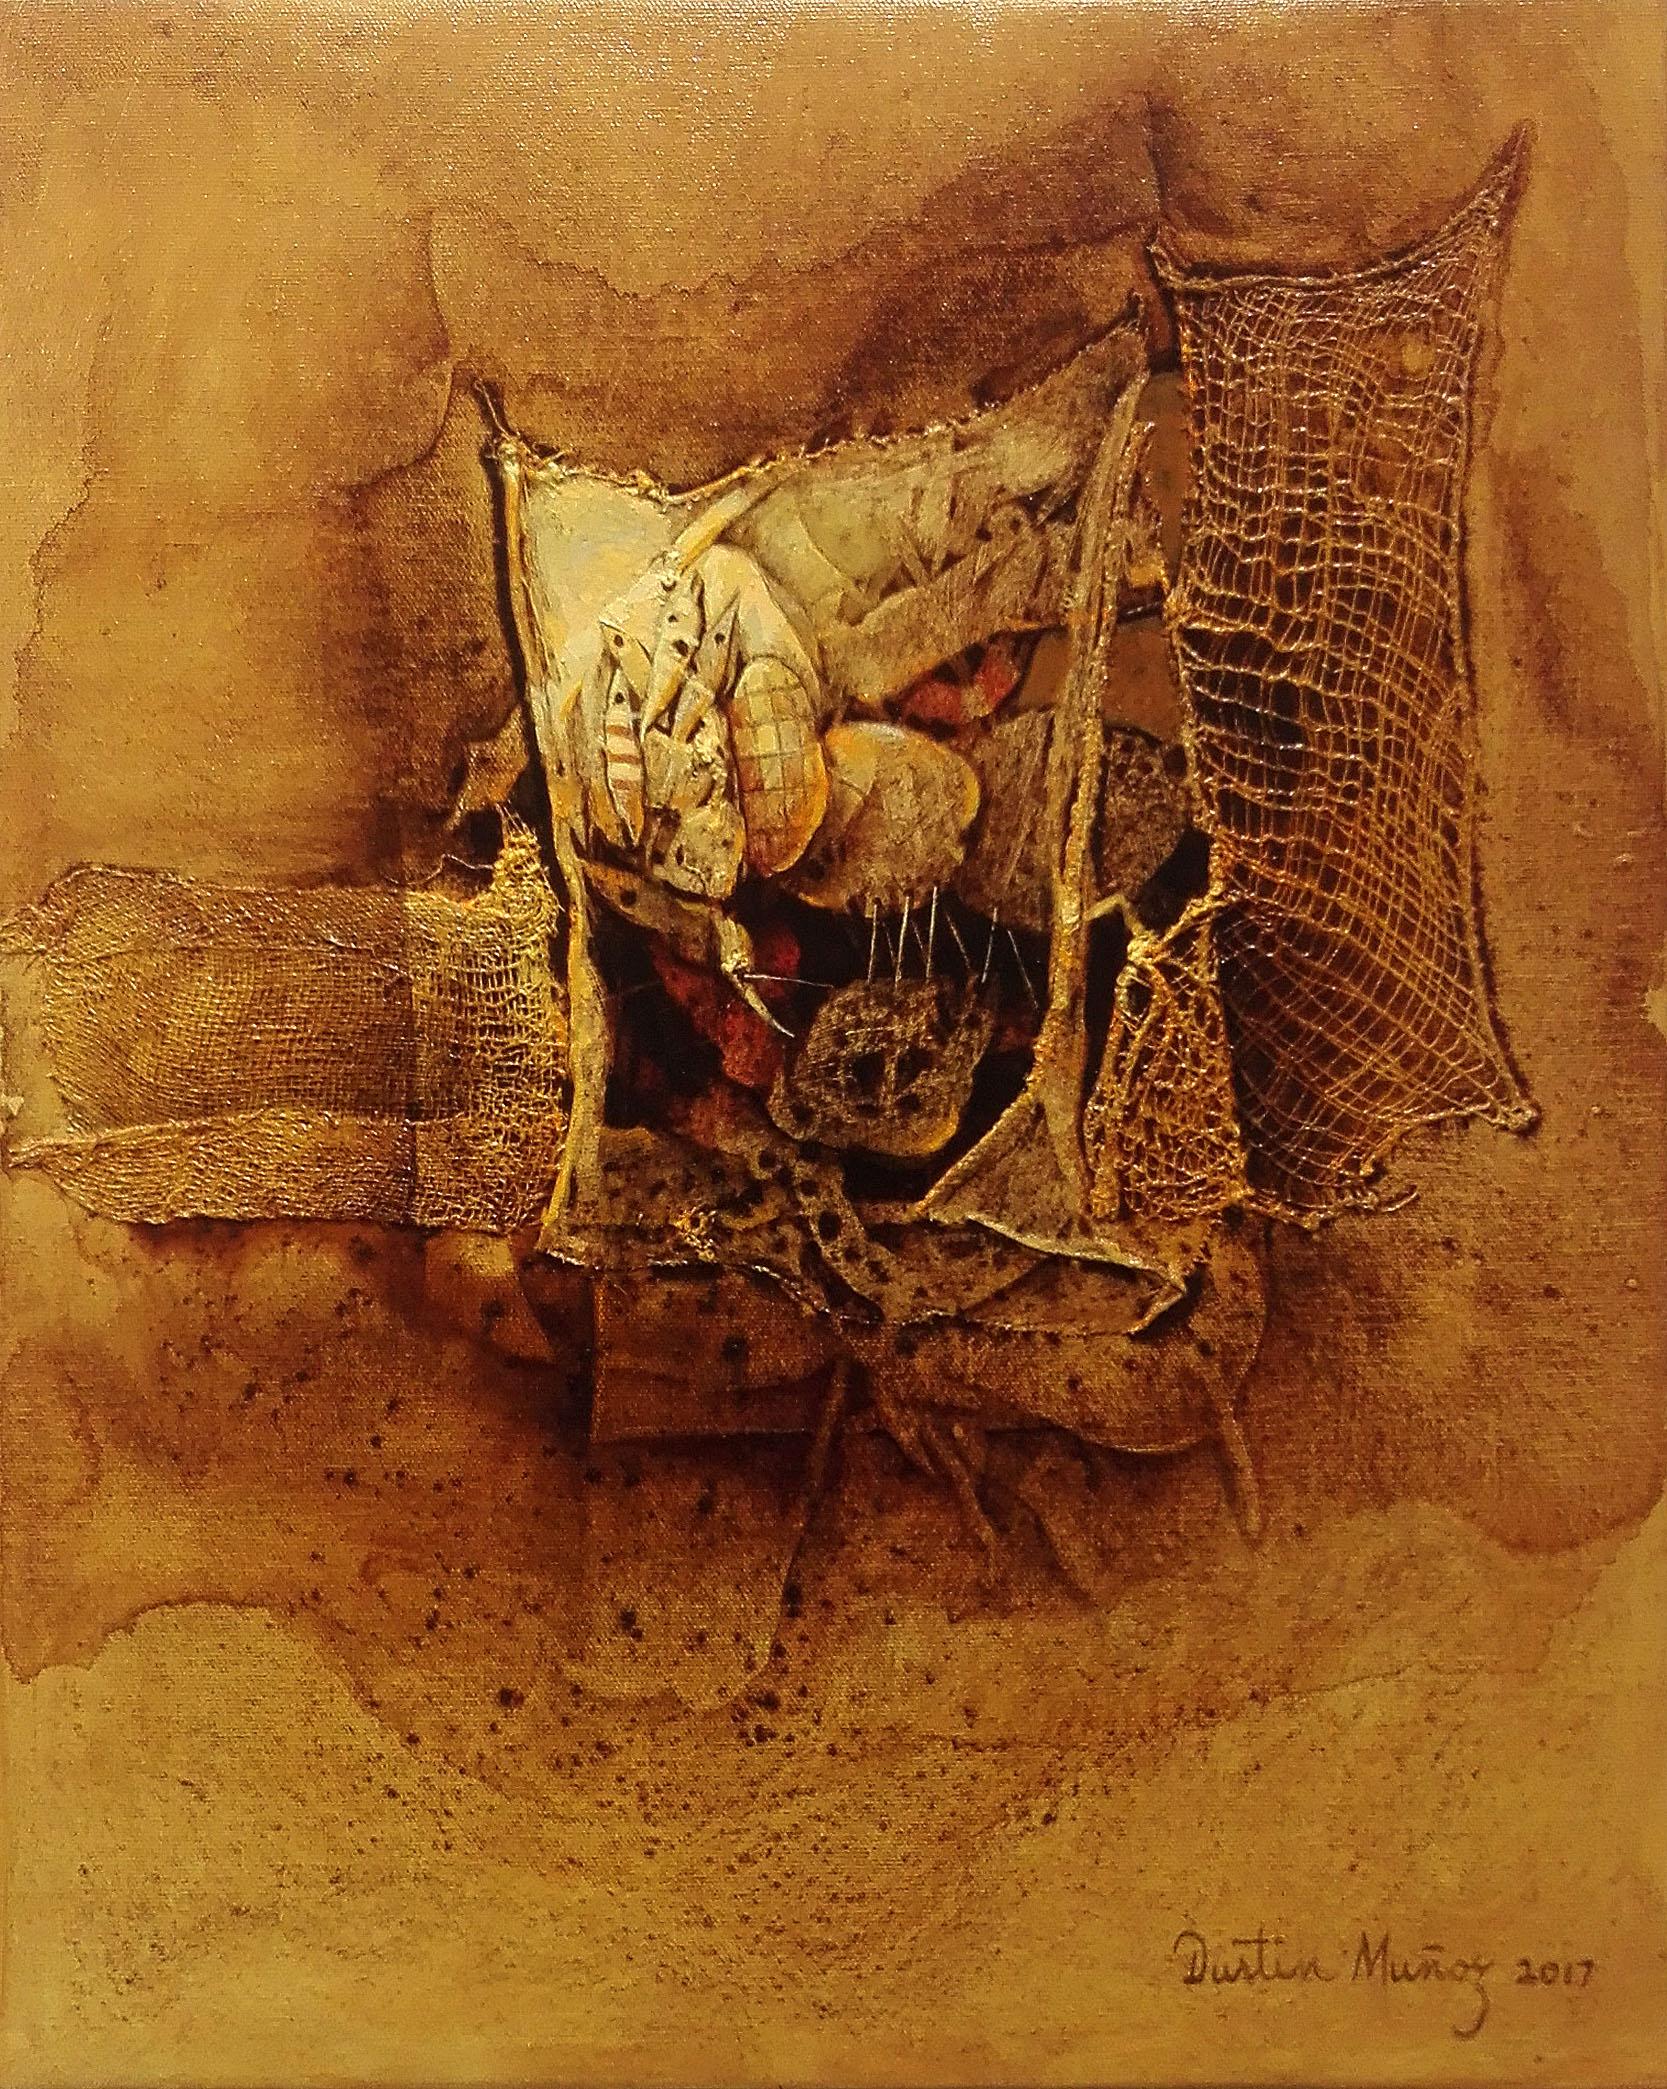 "La cosecha II, 20""x16"", 2017, Dustin Muñoz"